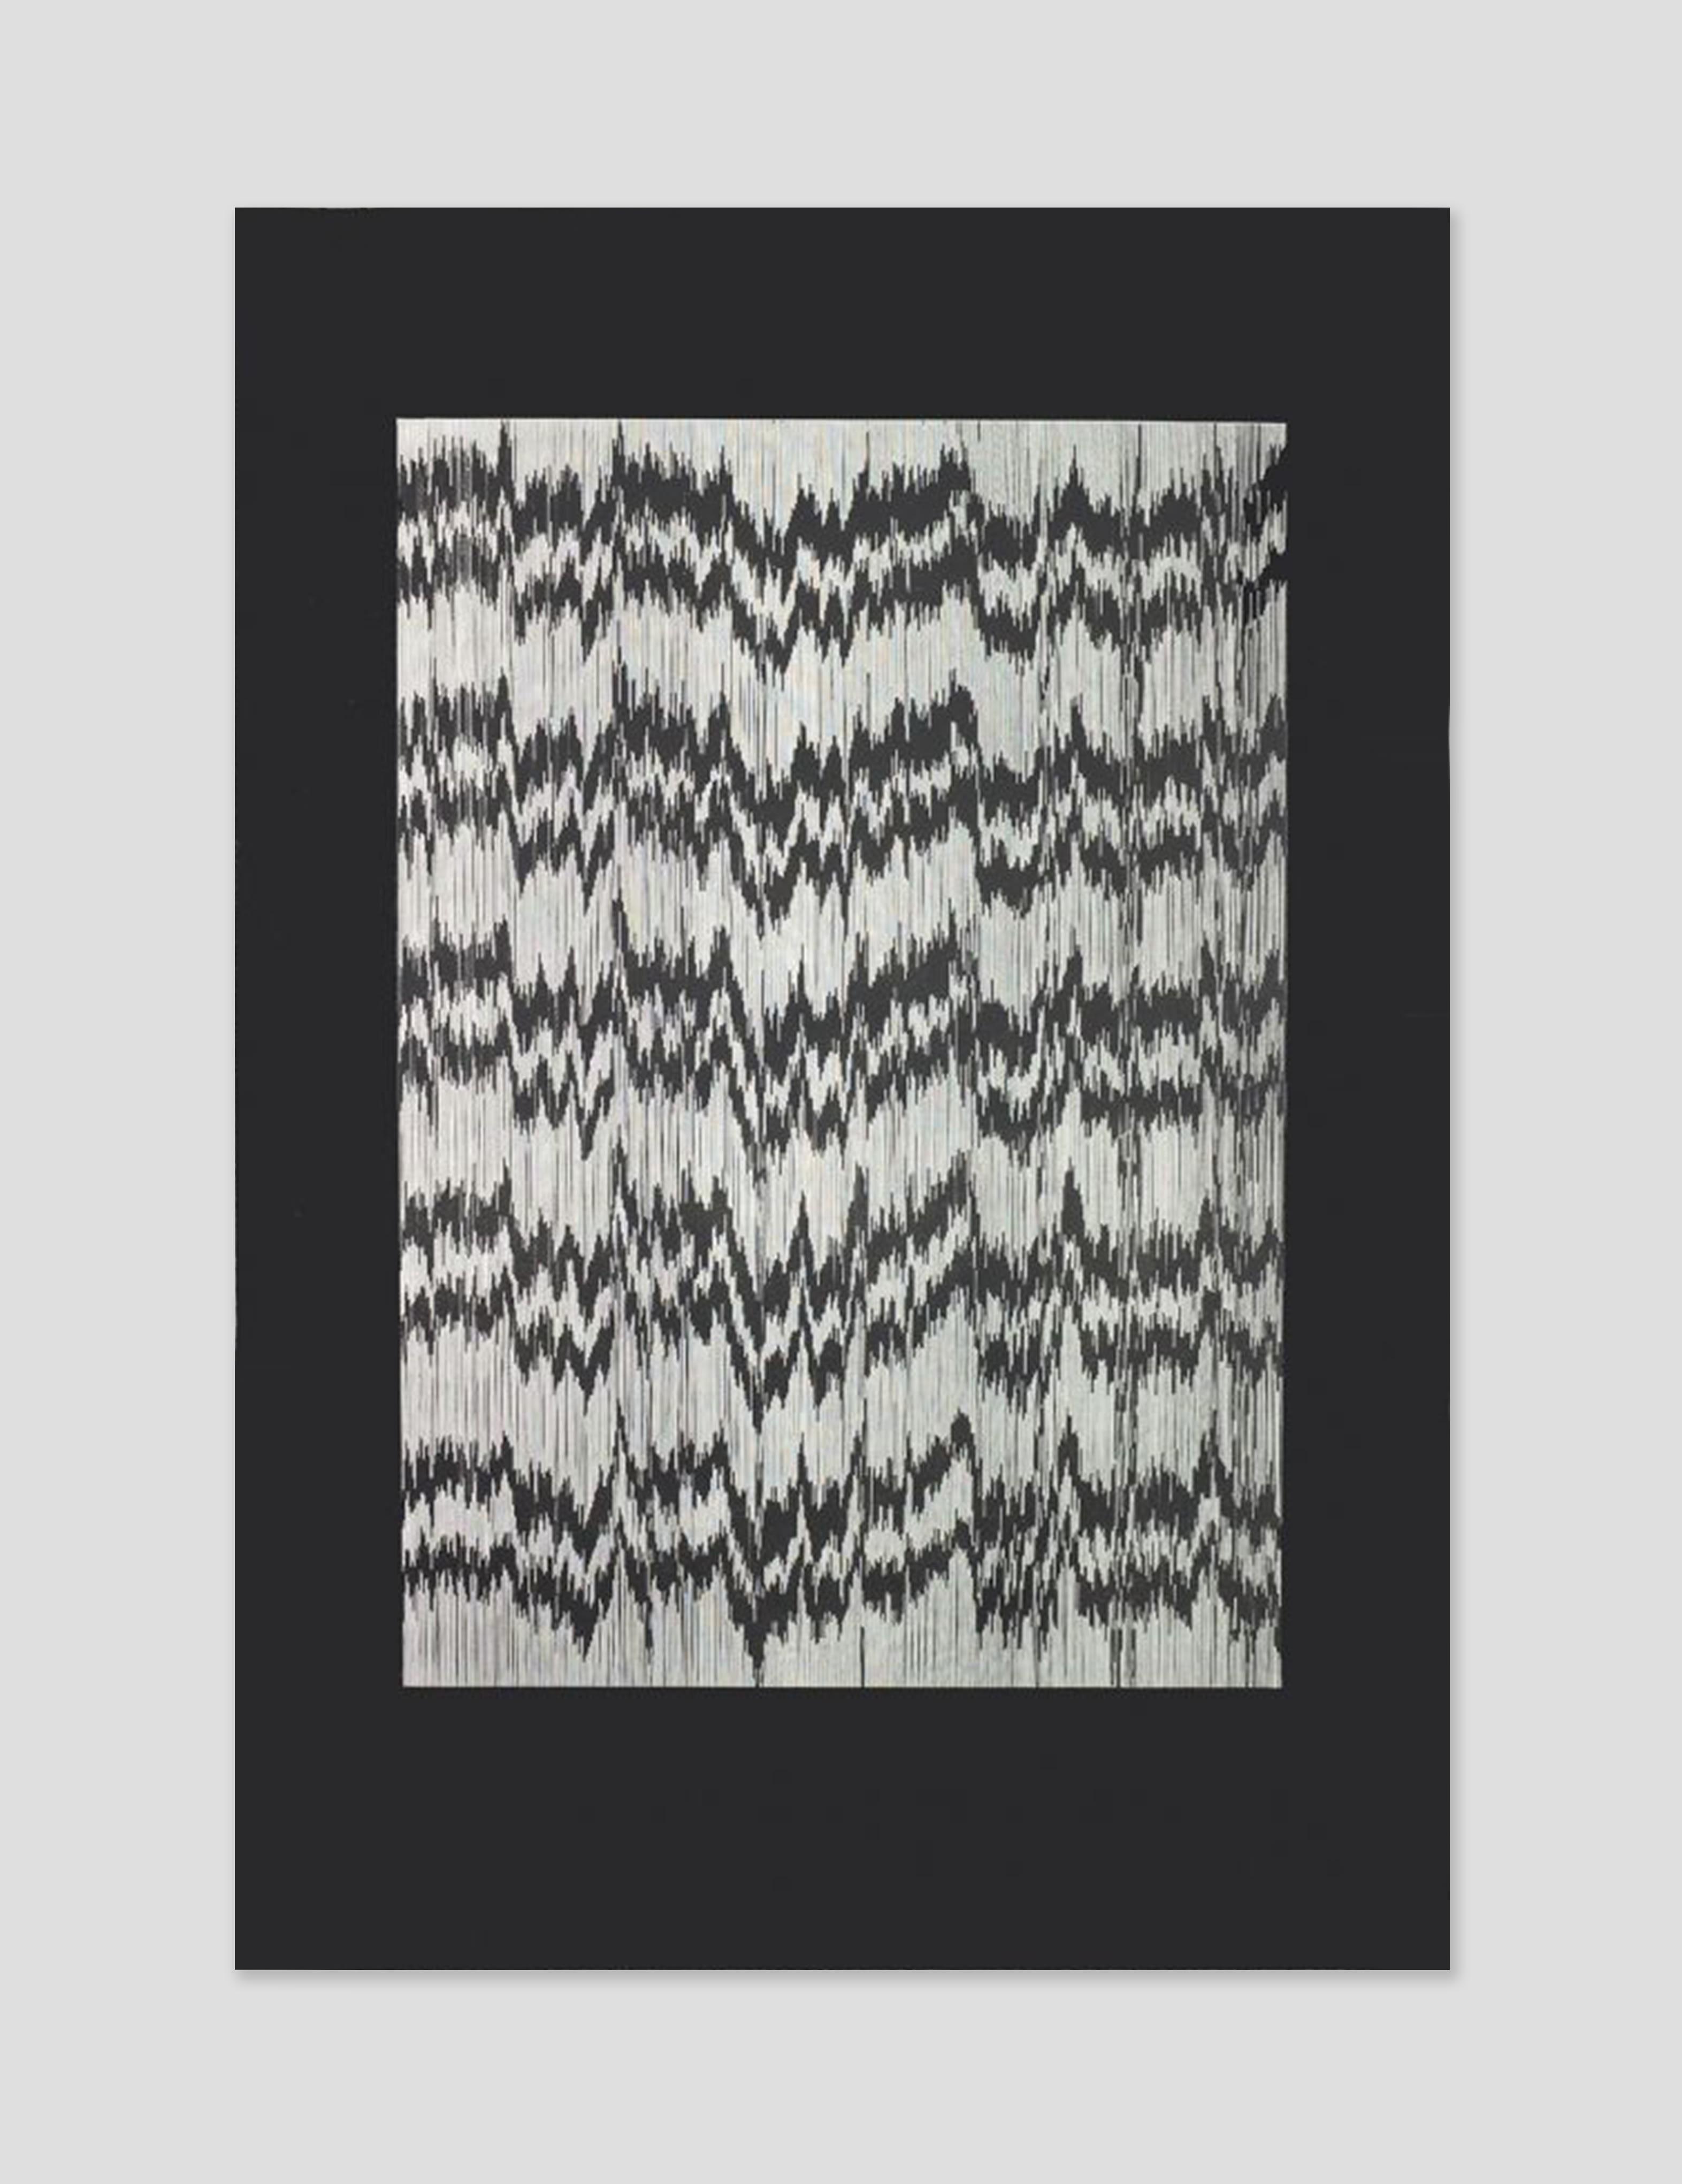 Fine Art Print by Tara Donovan at Zane Bennett Contemporary Art